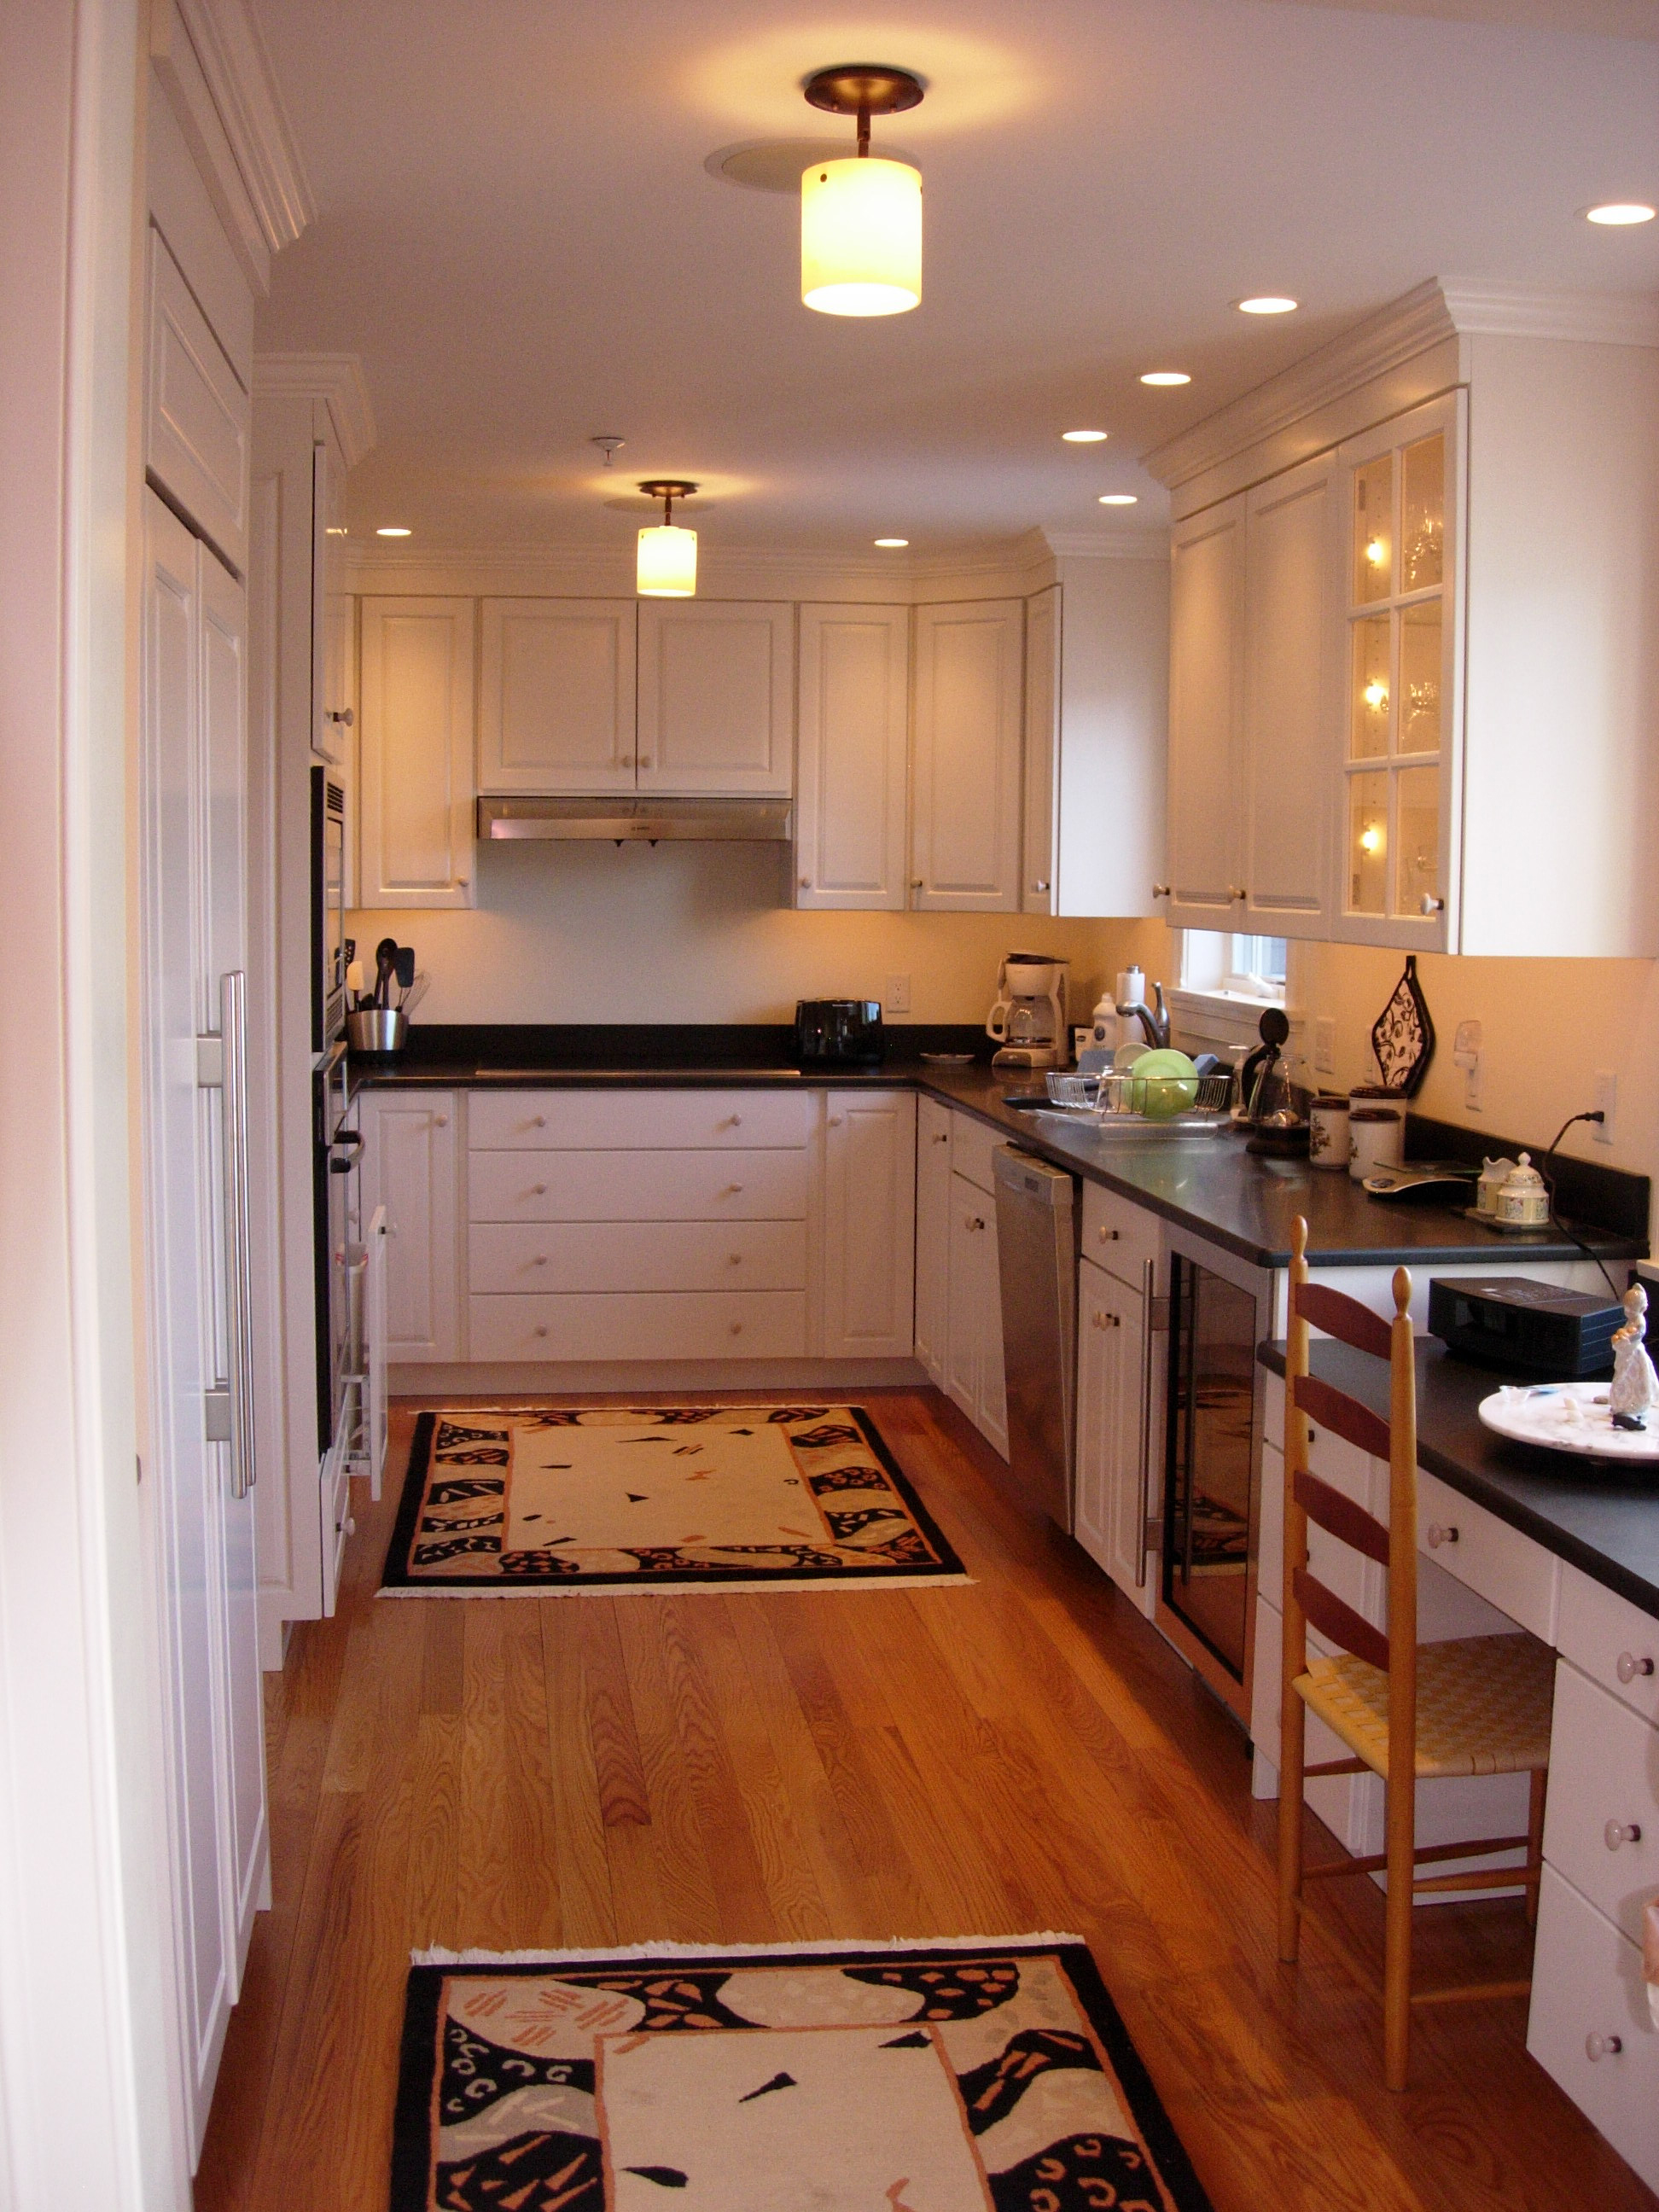 Дизайн кухни на лоджии (44 фото): объединение гостиной, совм.